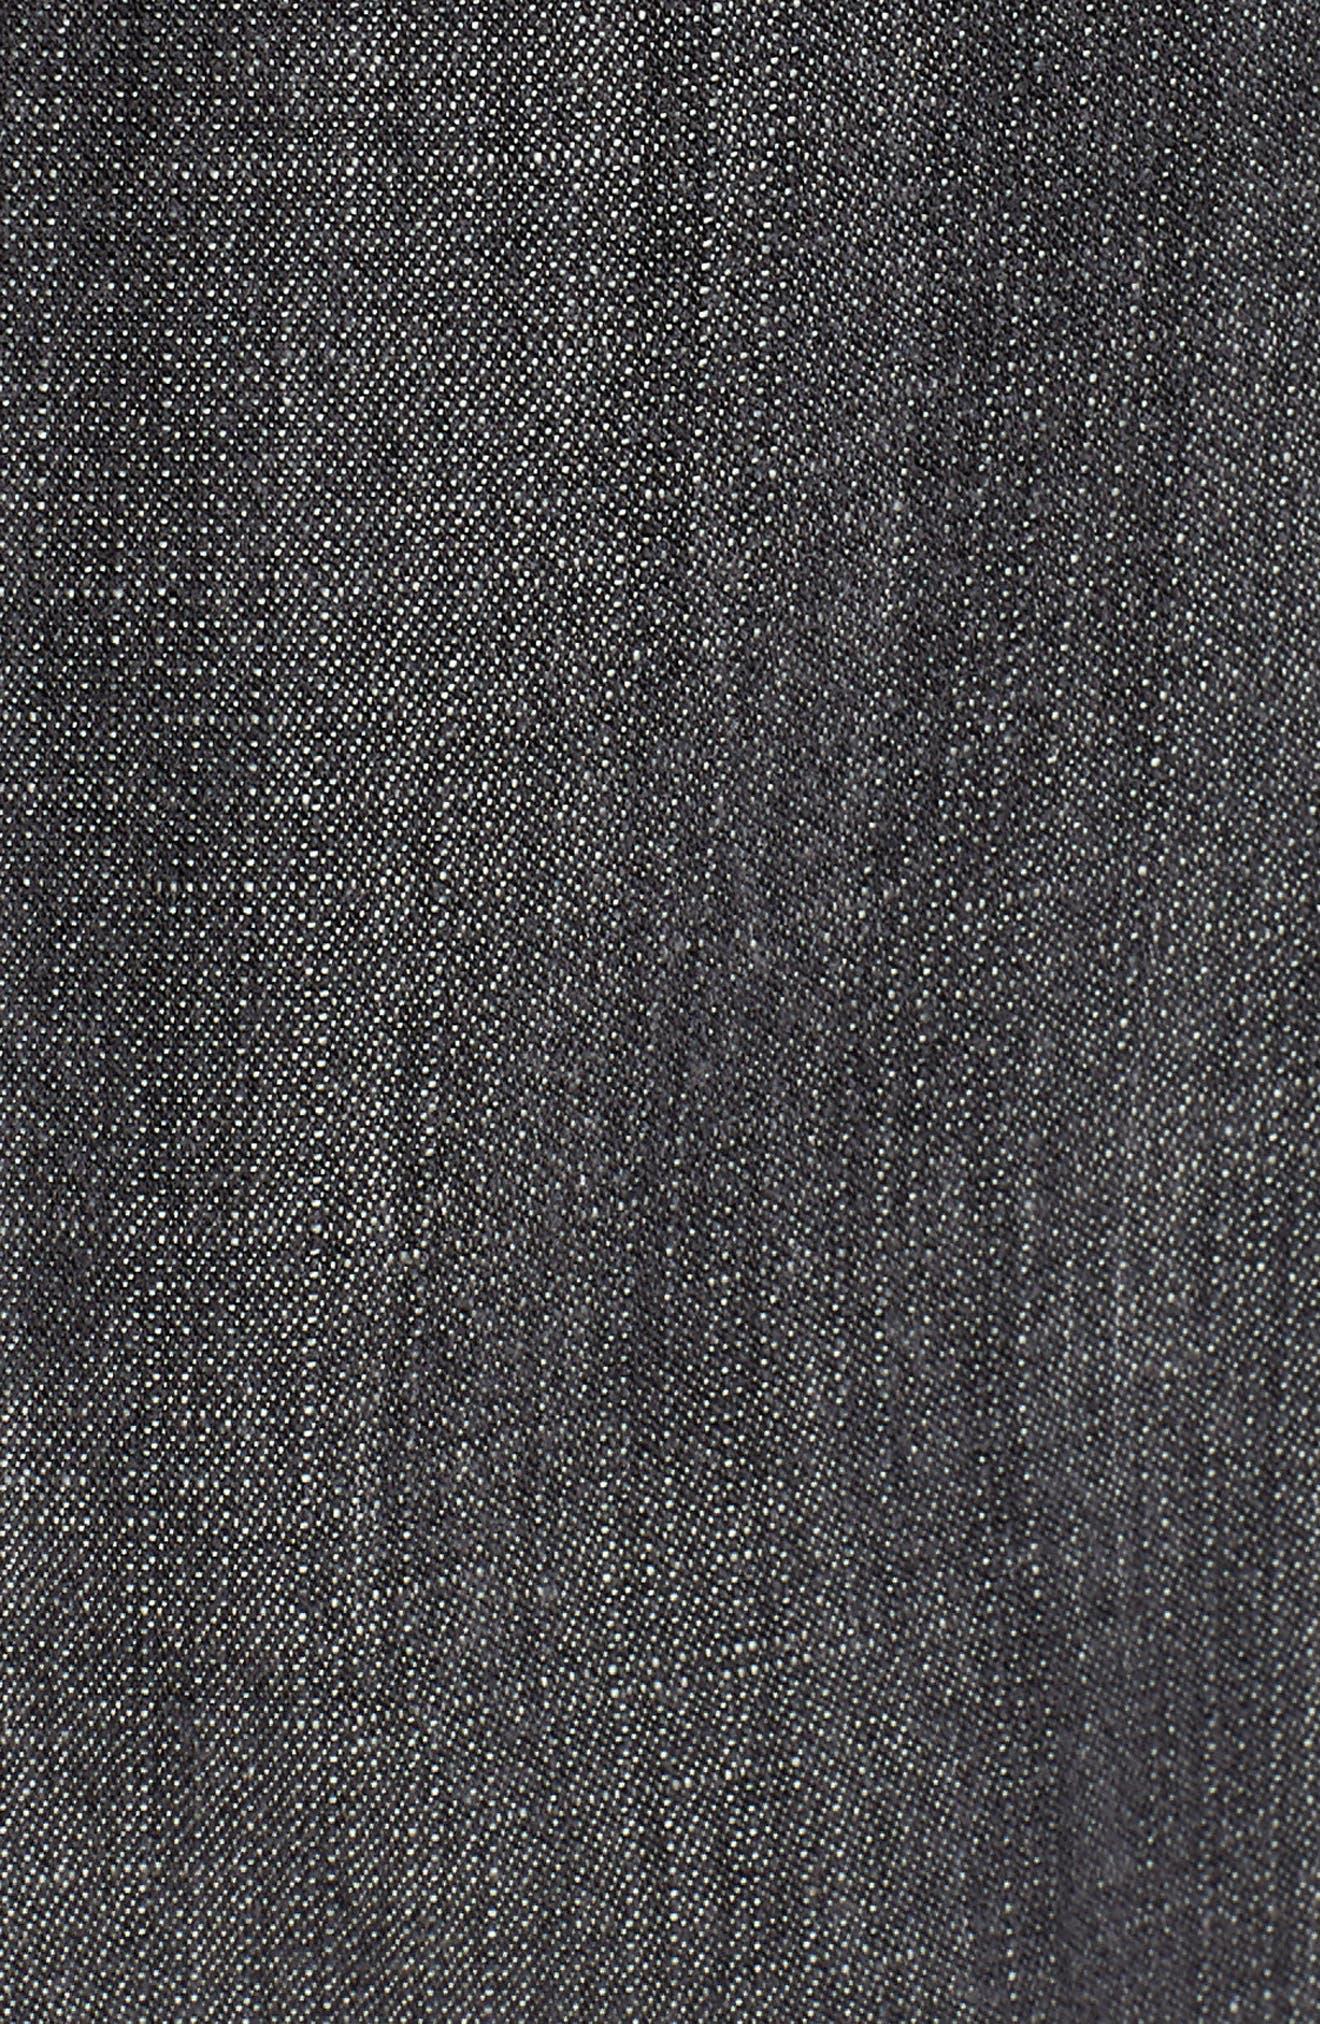 Crop Denim Jacket,                             Alternate thumbnail 6, color,                             Black